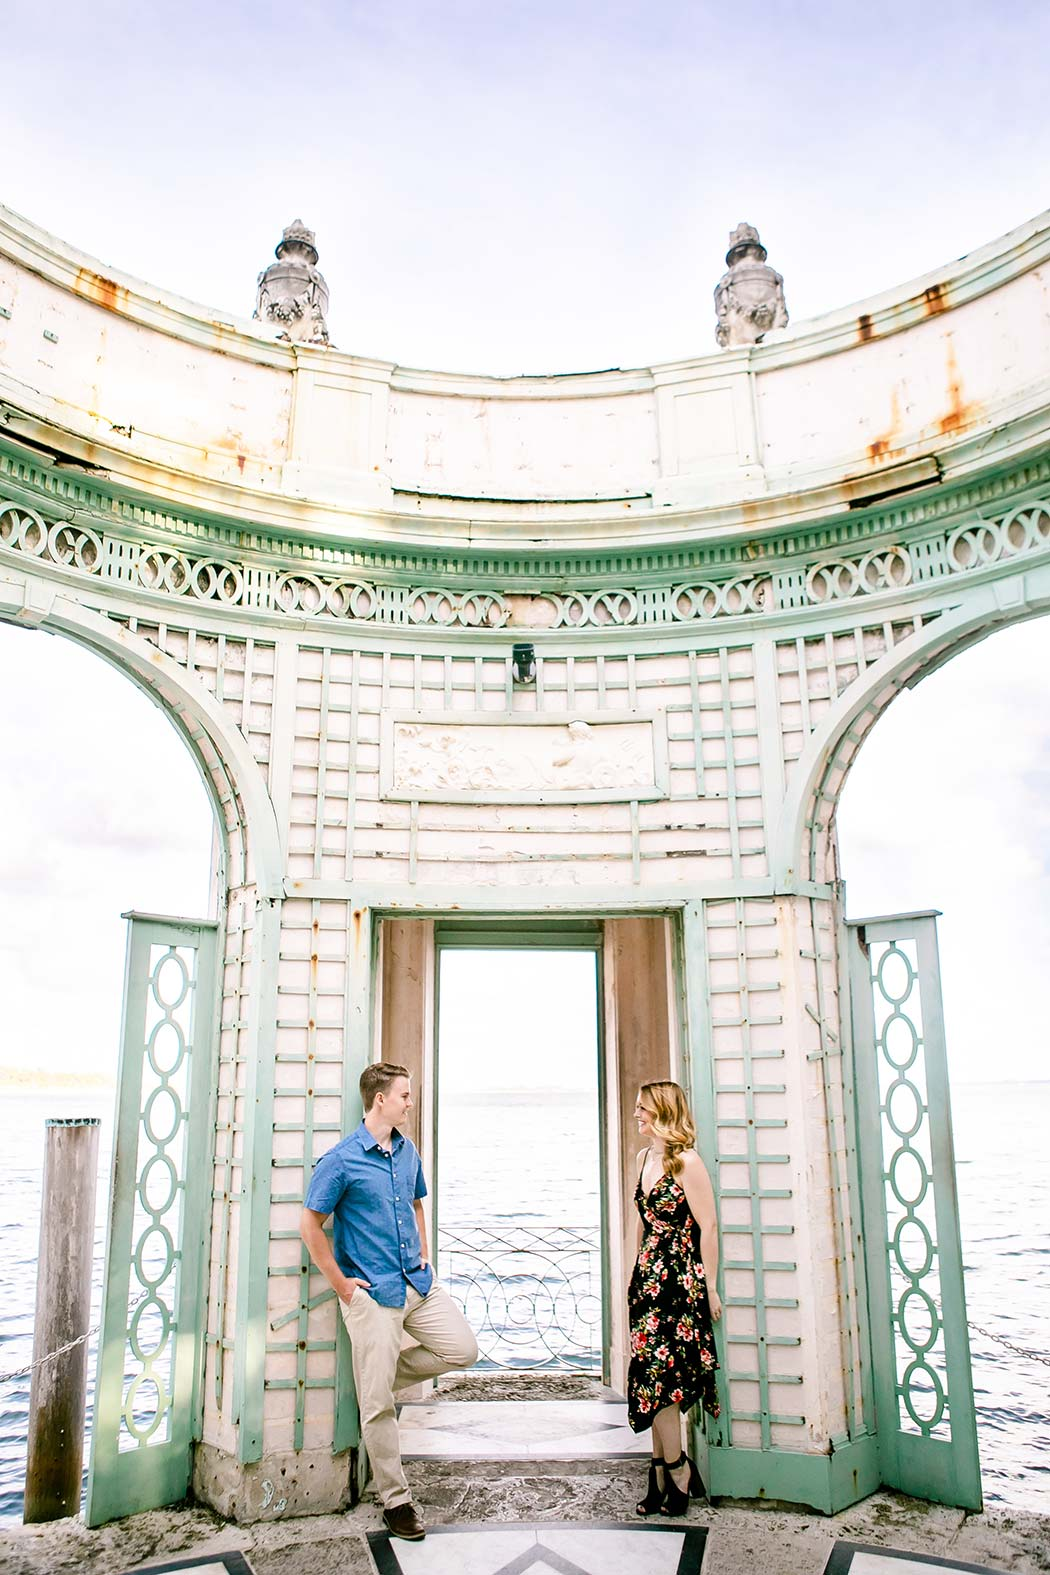 engagement photoshoot vizcaya miami | couple pose in tea house at vizcaya | vizcaya surprise wedding proposal photoshoot